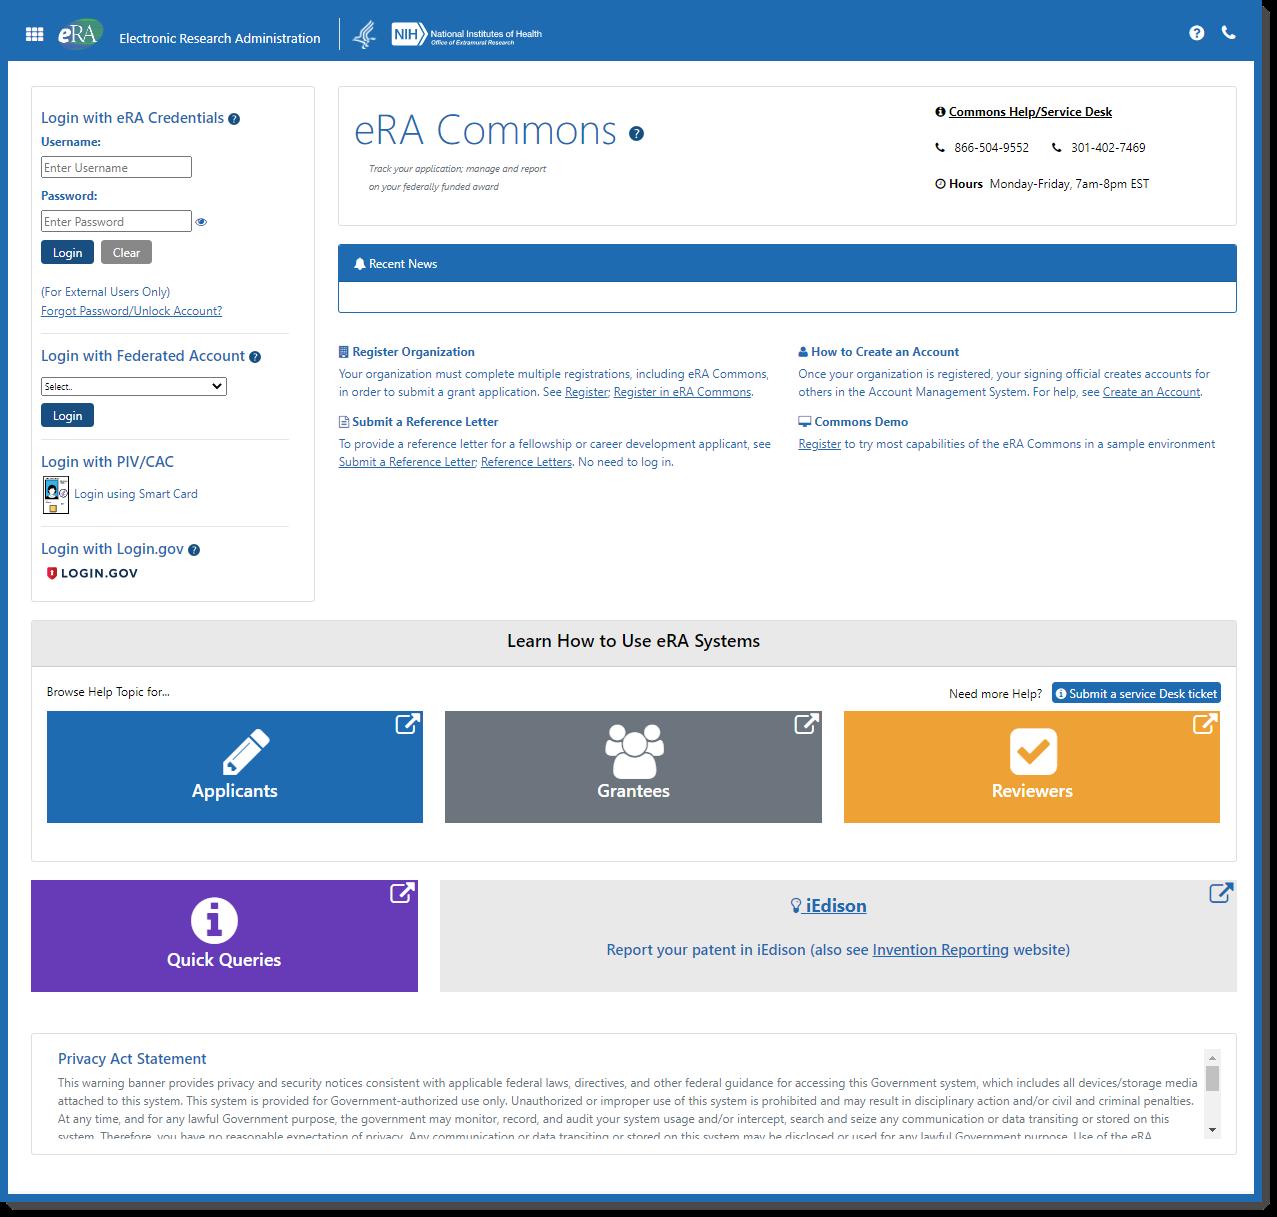 Screenshot of the new eRA Commons log-in screen.